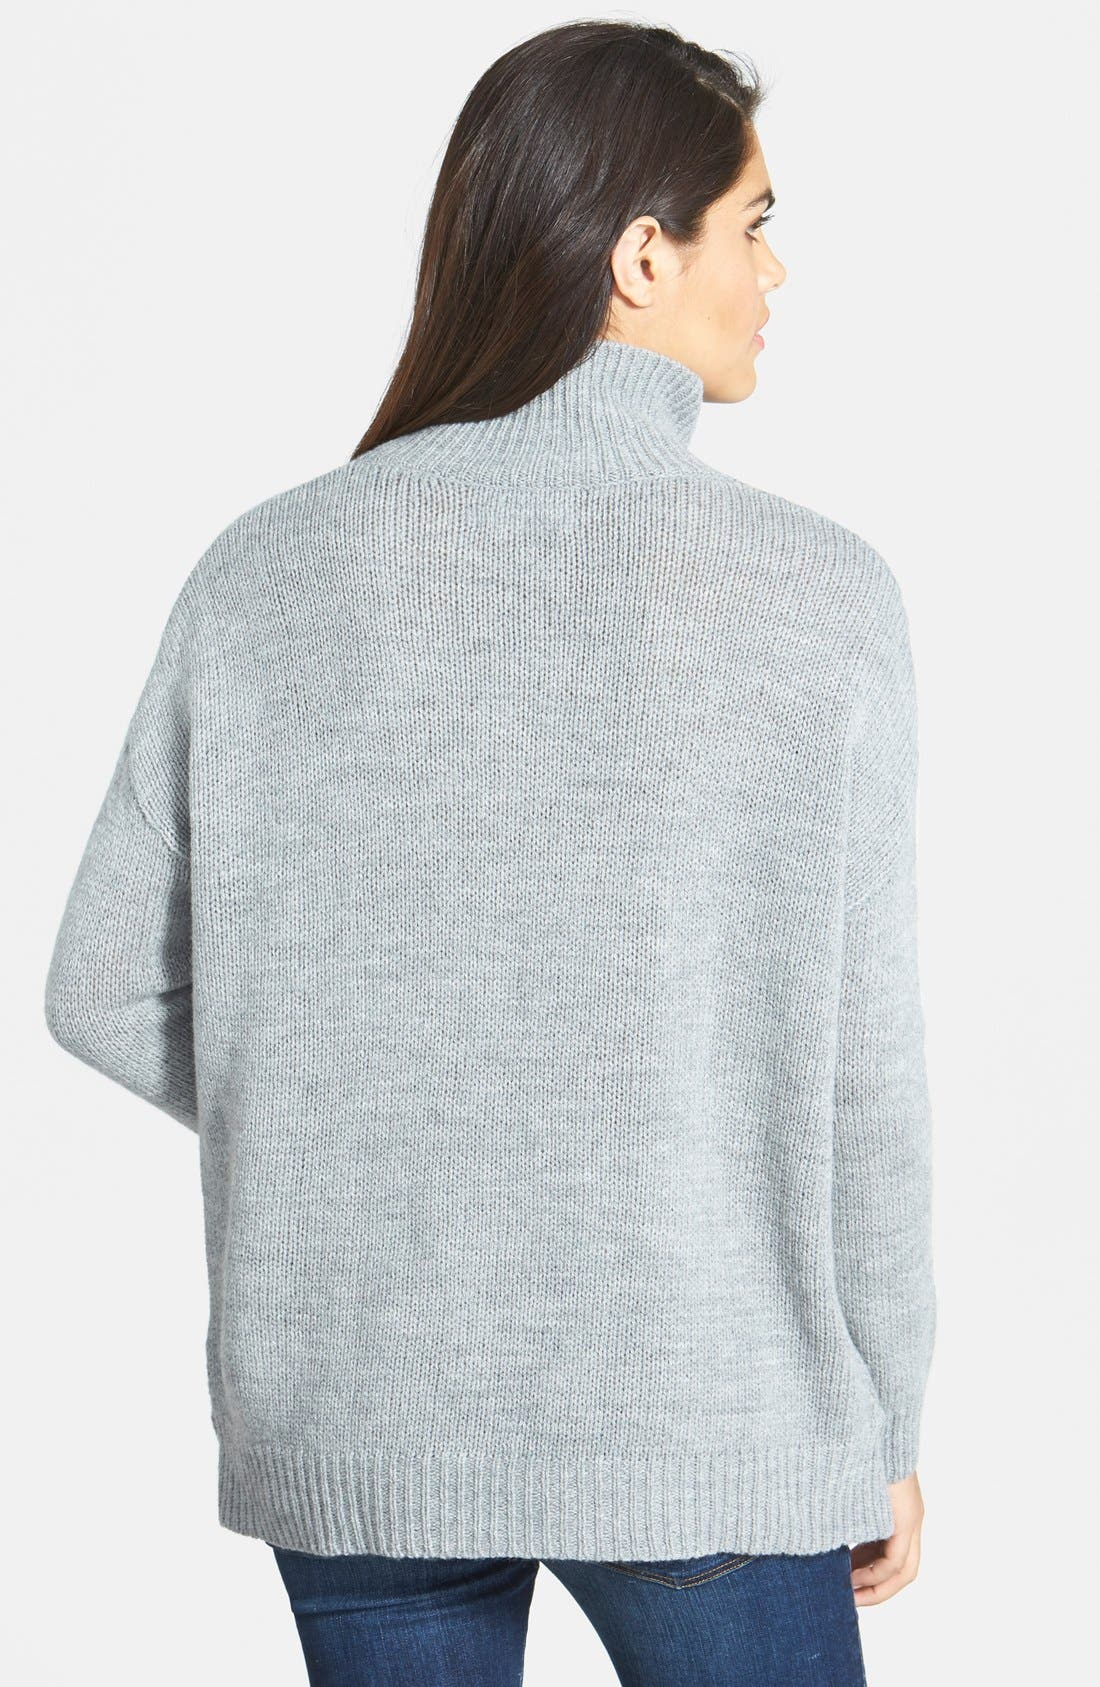 Boyfriend Turtleneck Sweater,                             Alternate thumbnail 2, color,                             020